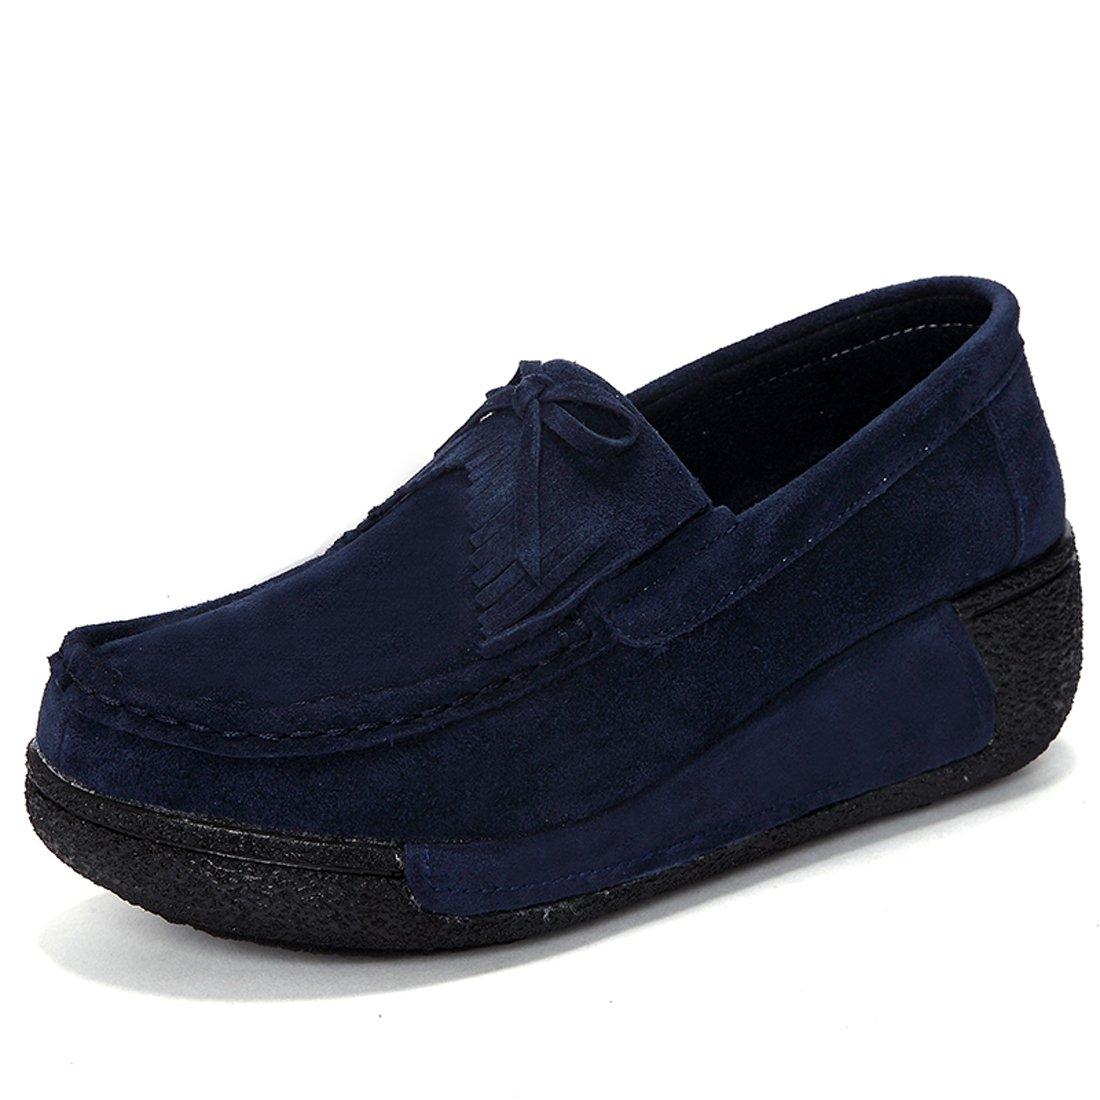 Z.SUO Mocassins Femmes Suède Casuel 19993 Confort Mocassins Z.SUO Chaussures Loafers Bleu.2 176206e - therethere.space